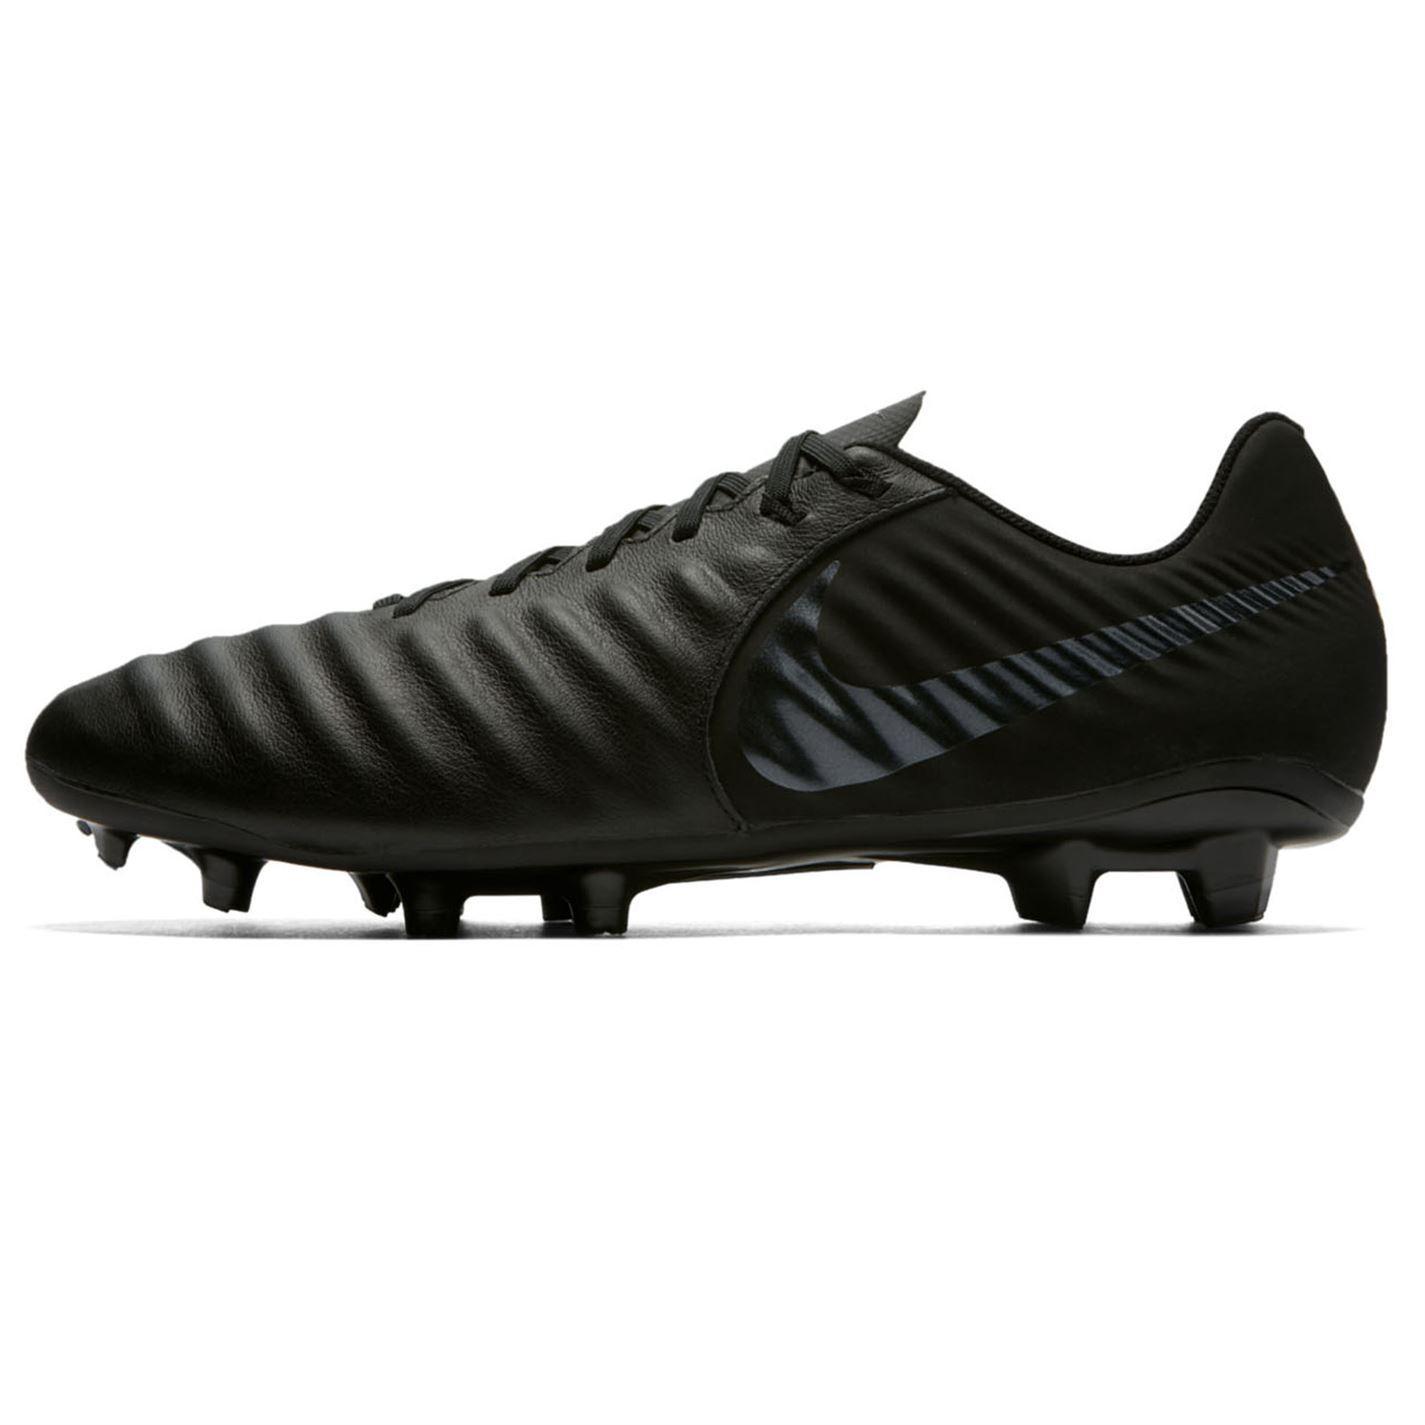 miniature 5 - Nike-Tiempo-Legend-Academy-FG-Firm-Ground-Chaussures-De-Football-Homme-Football-Chaussures-Crampons